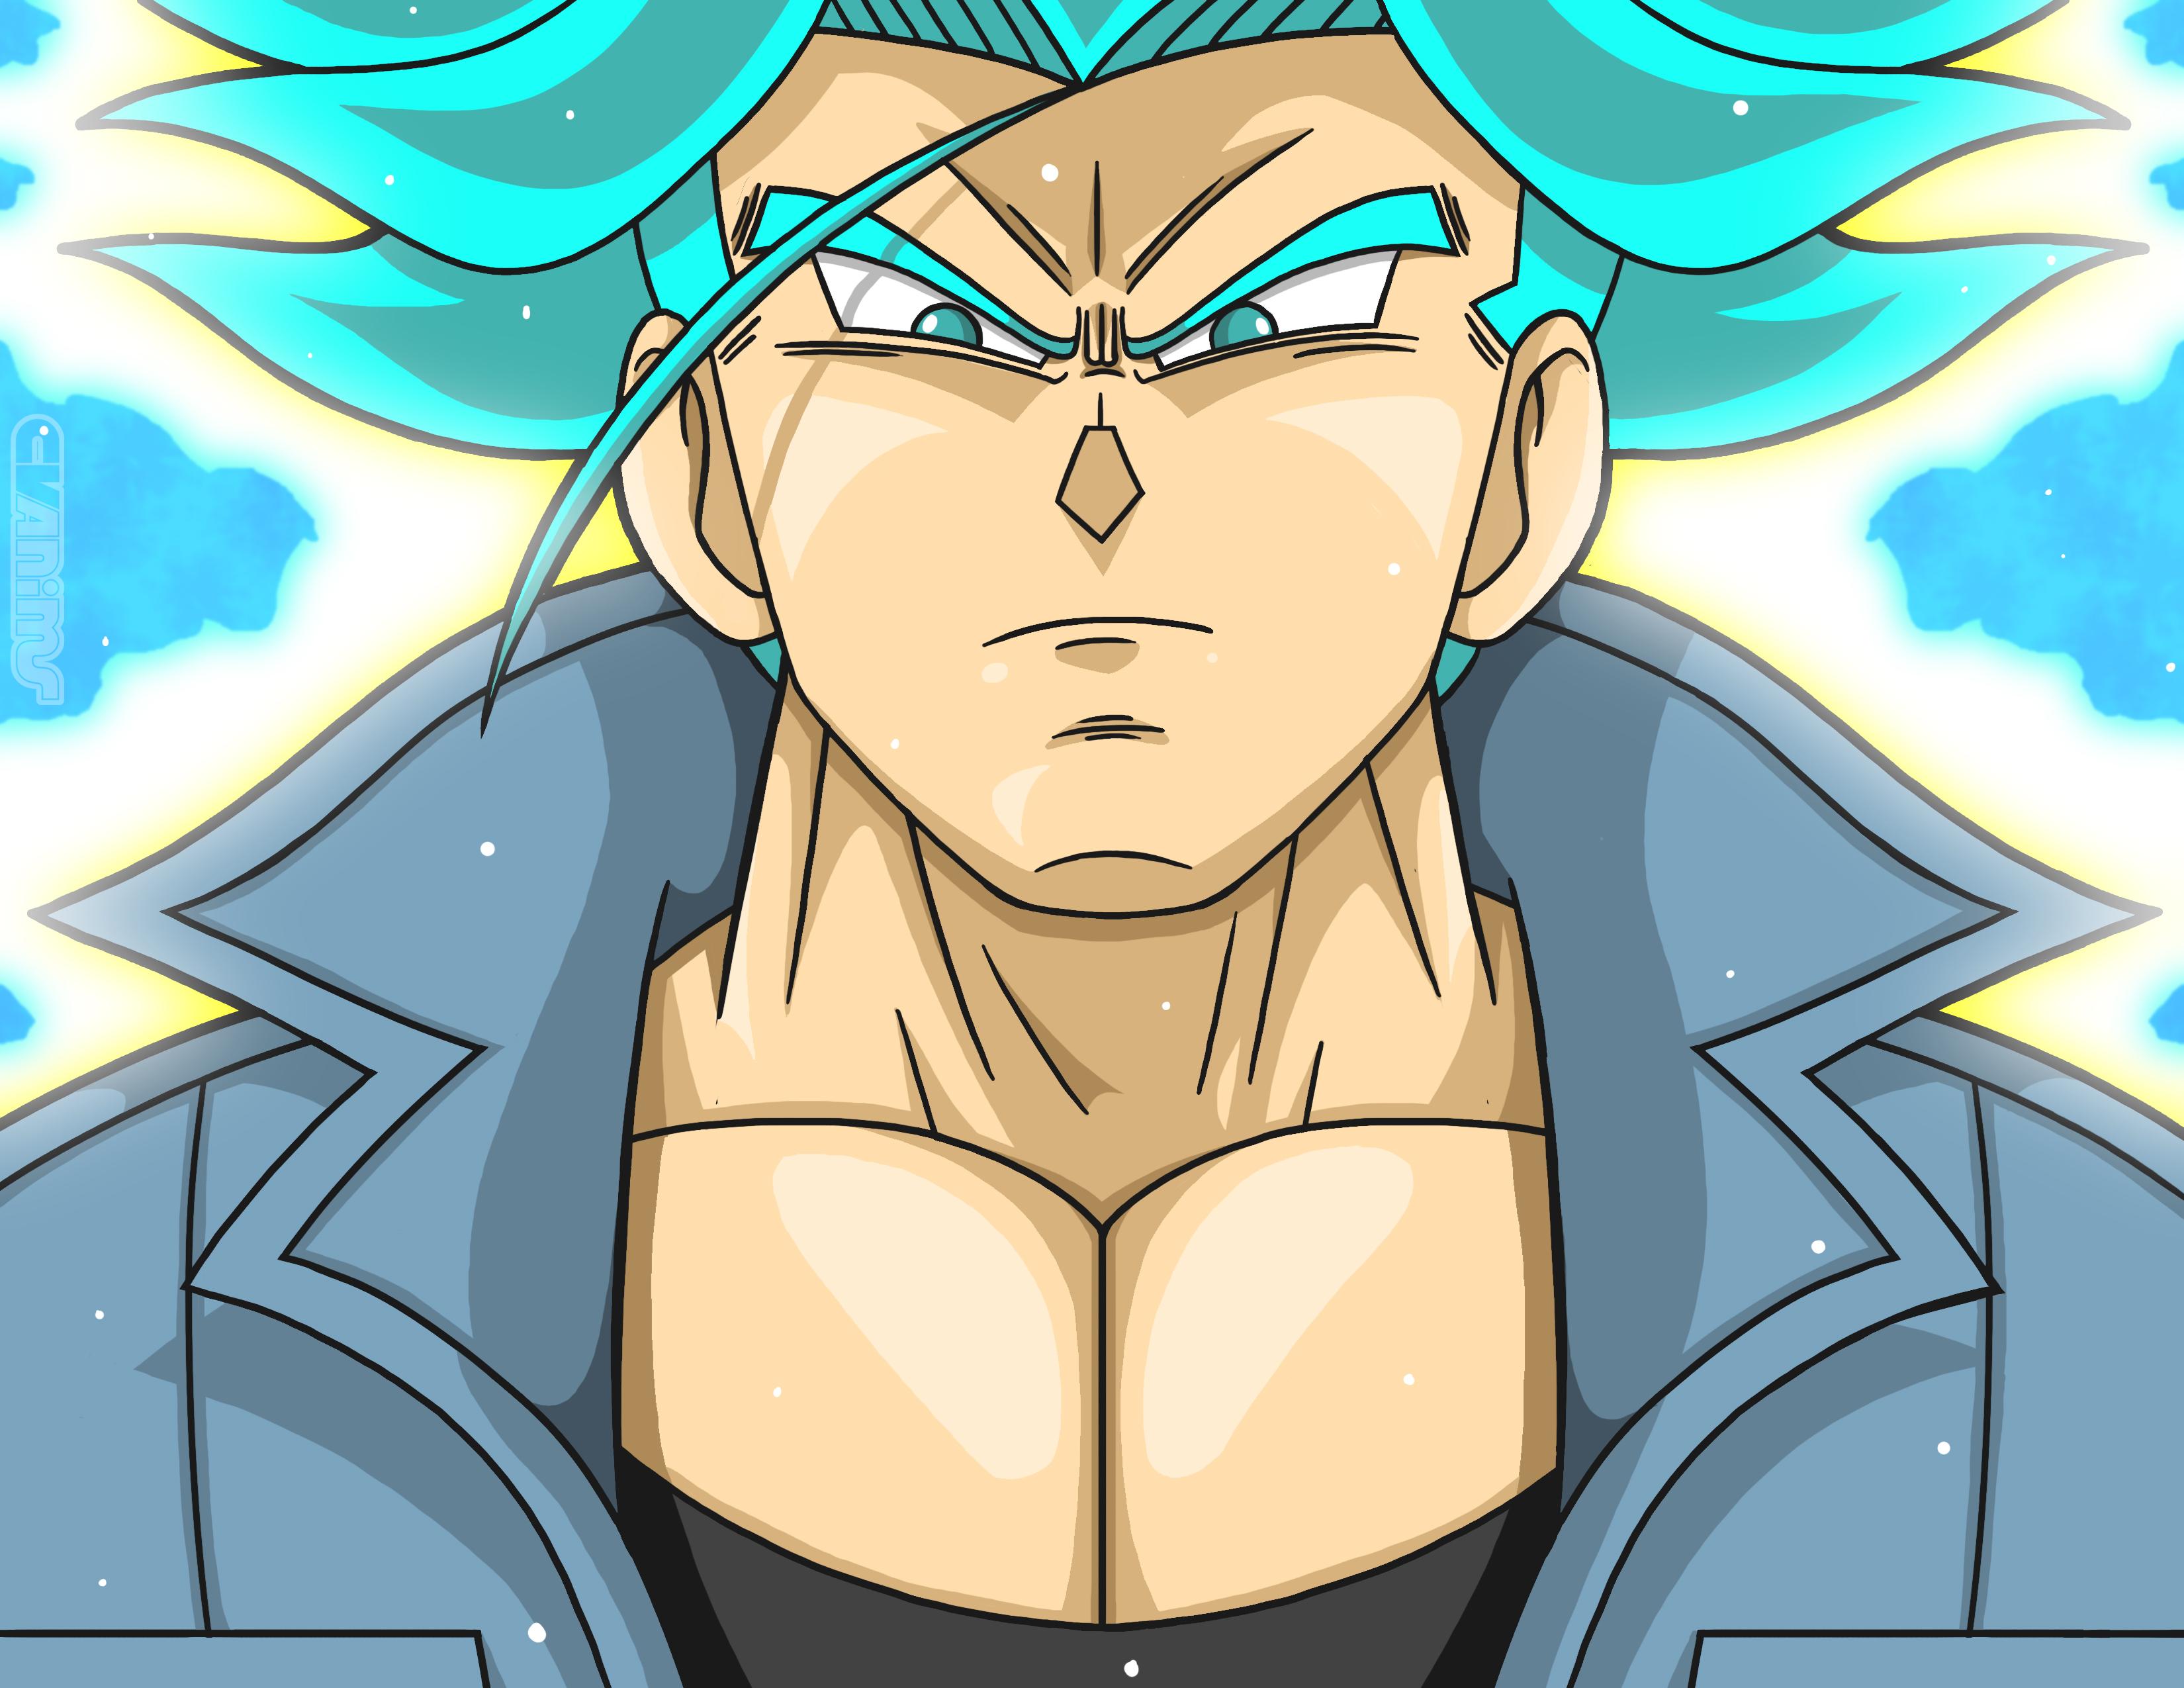 Super Saiyan Blue FUTURE TRUNKS?!?!